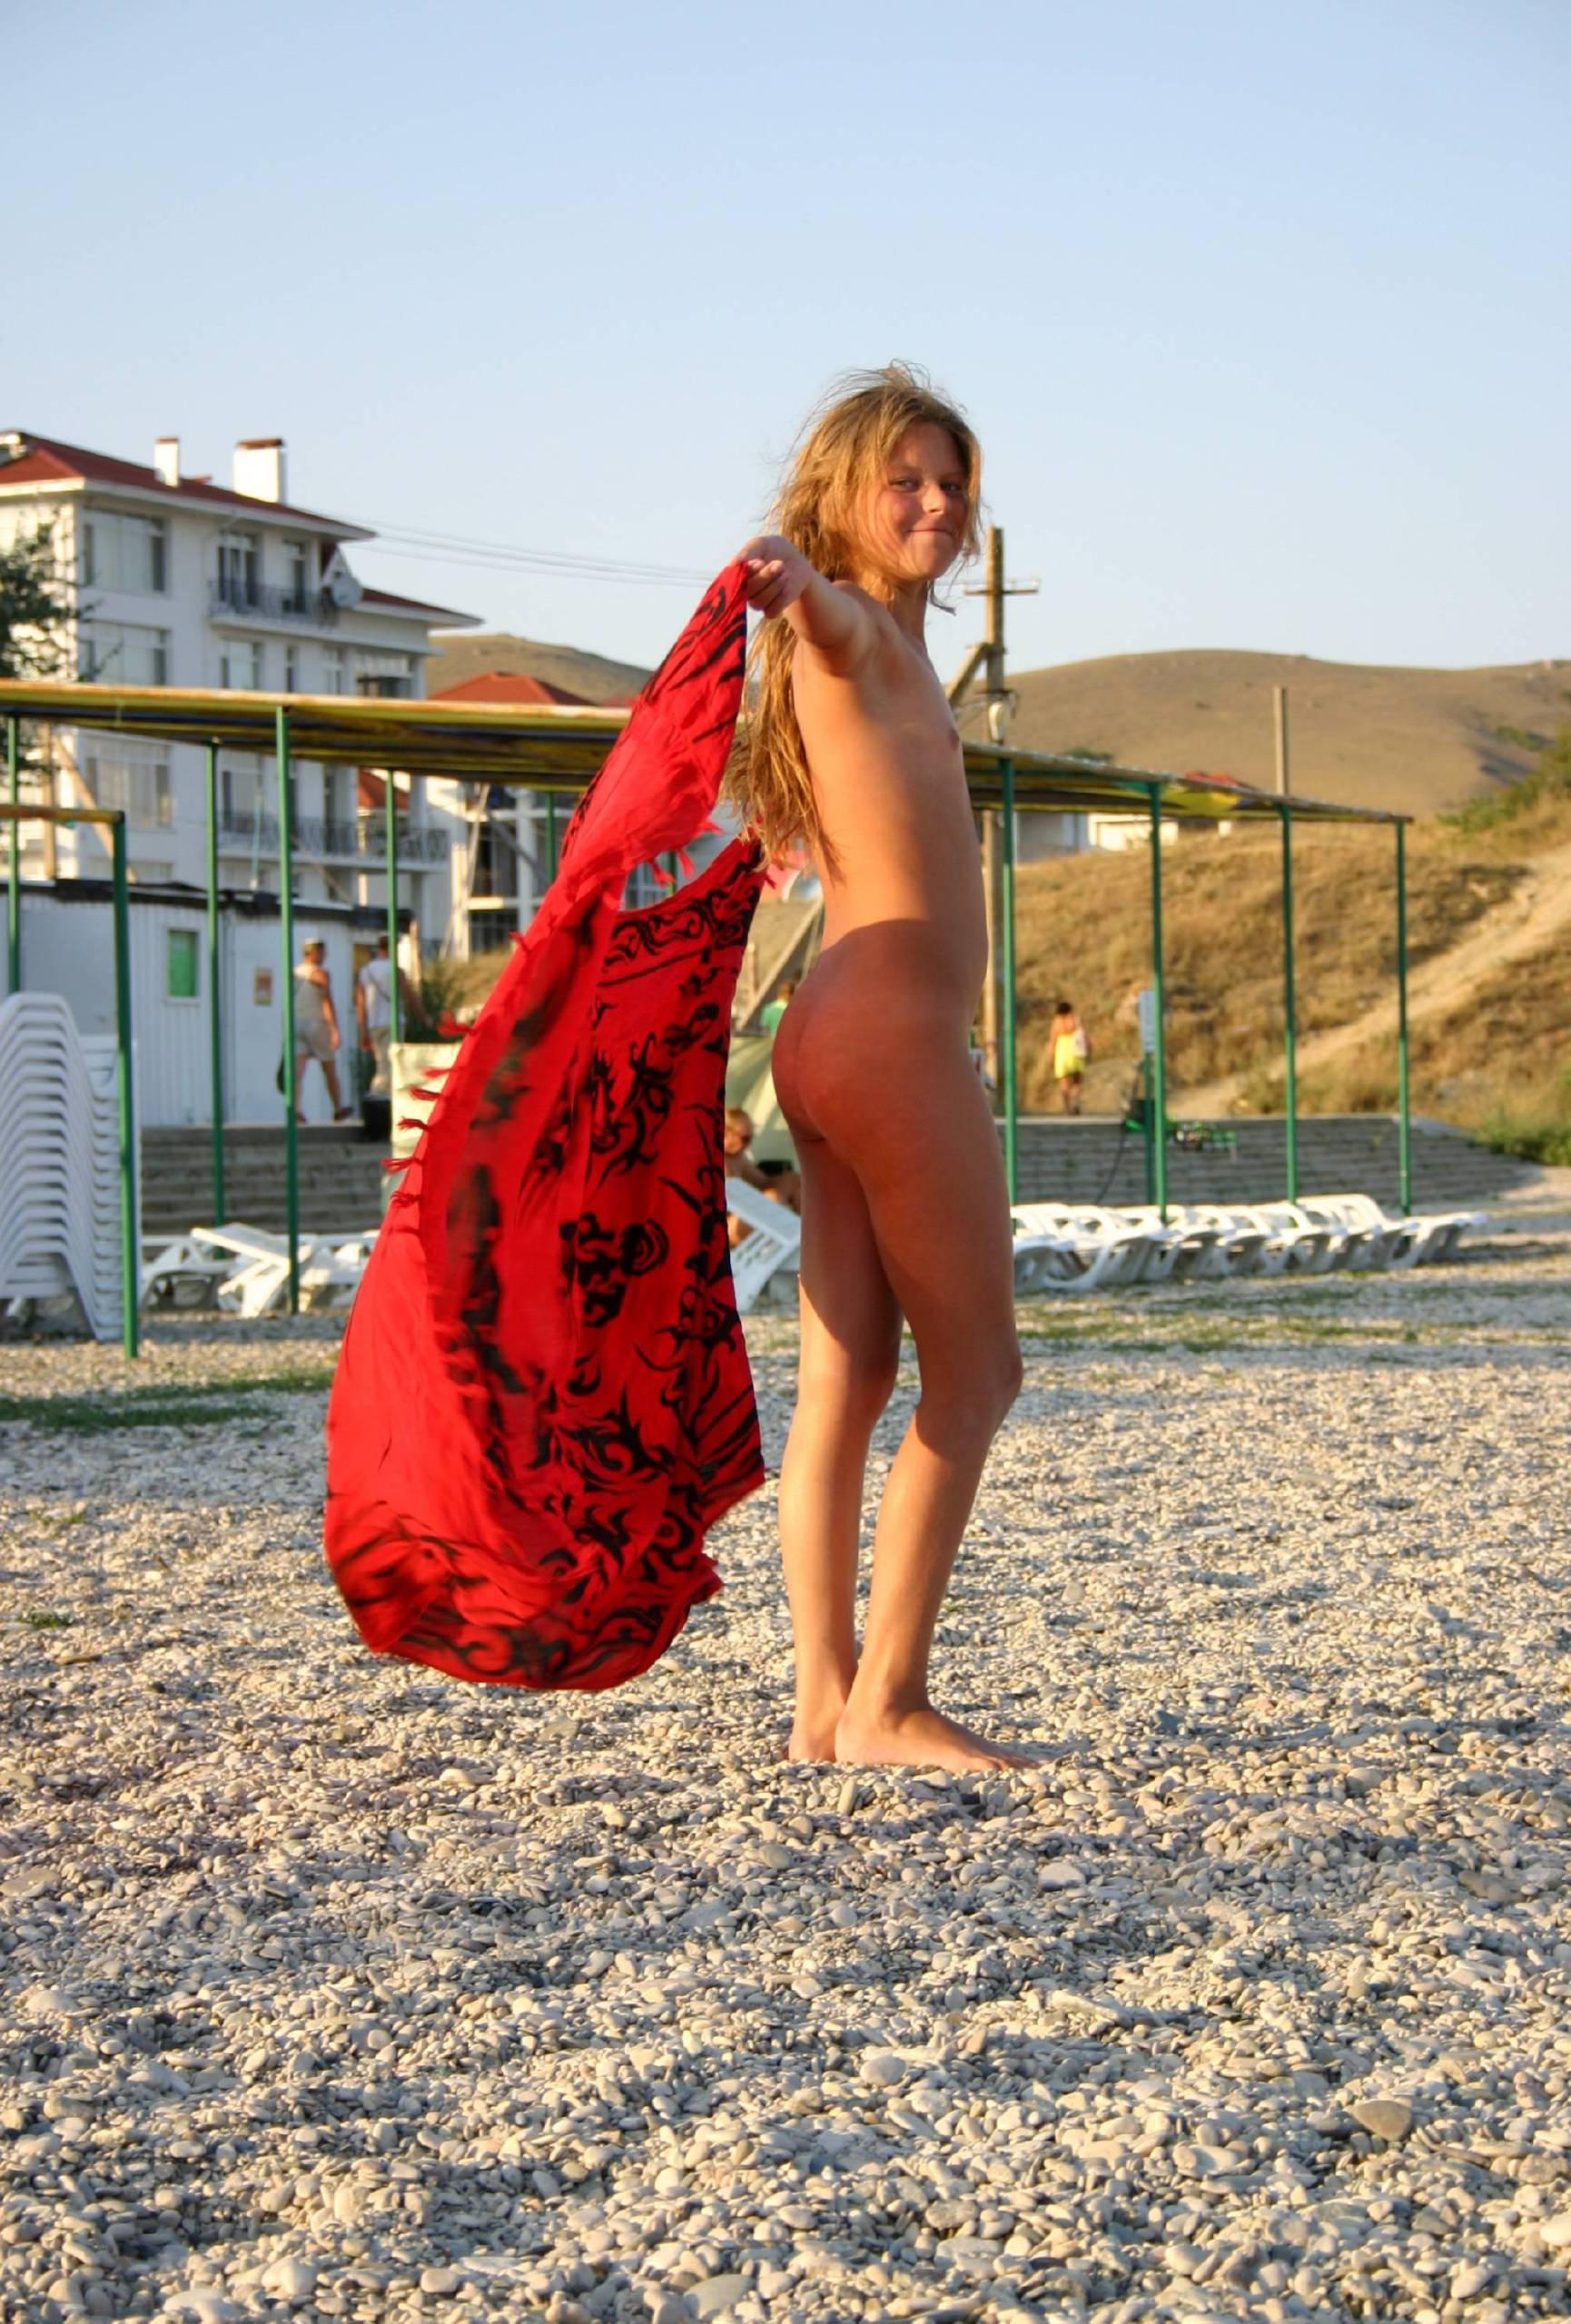 Red Scarlet Beach Dance - 1